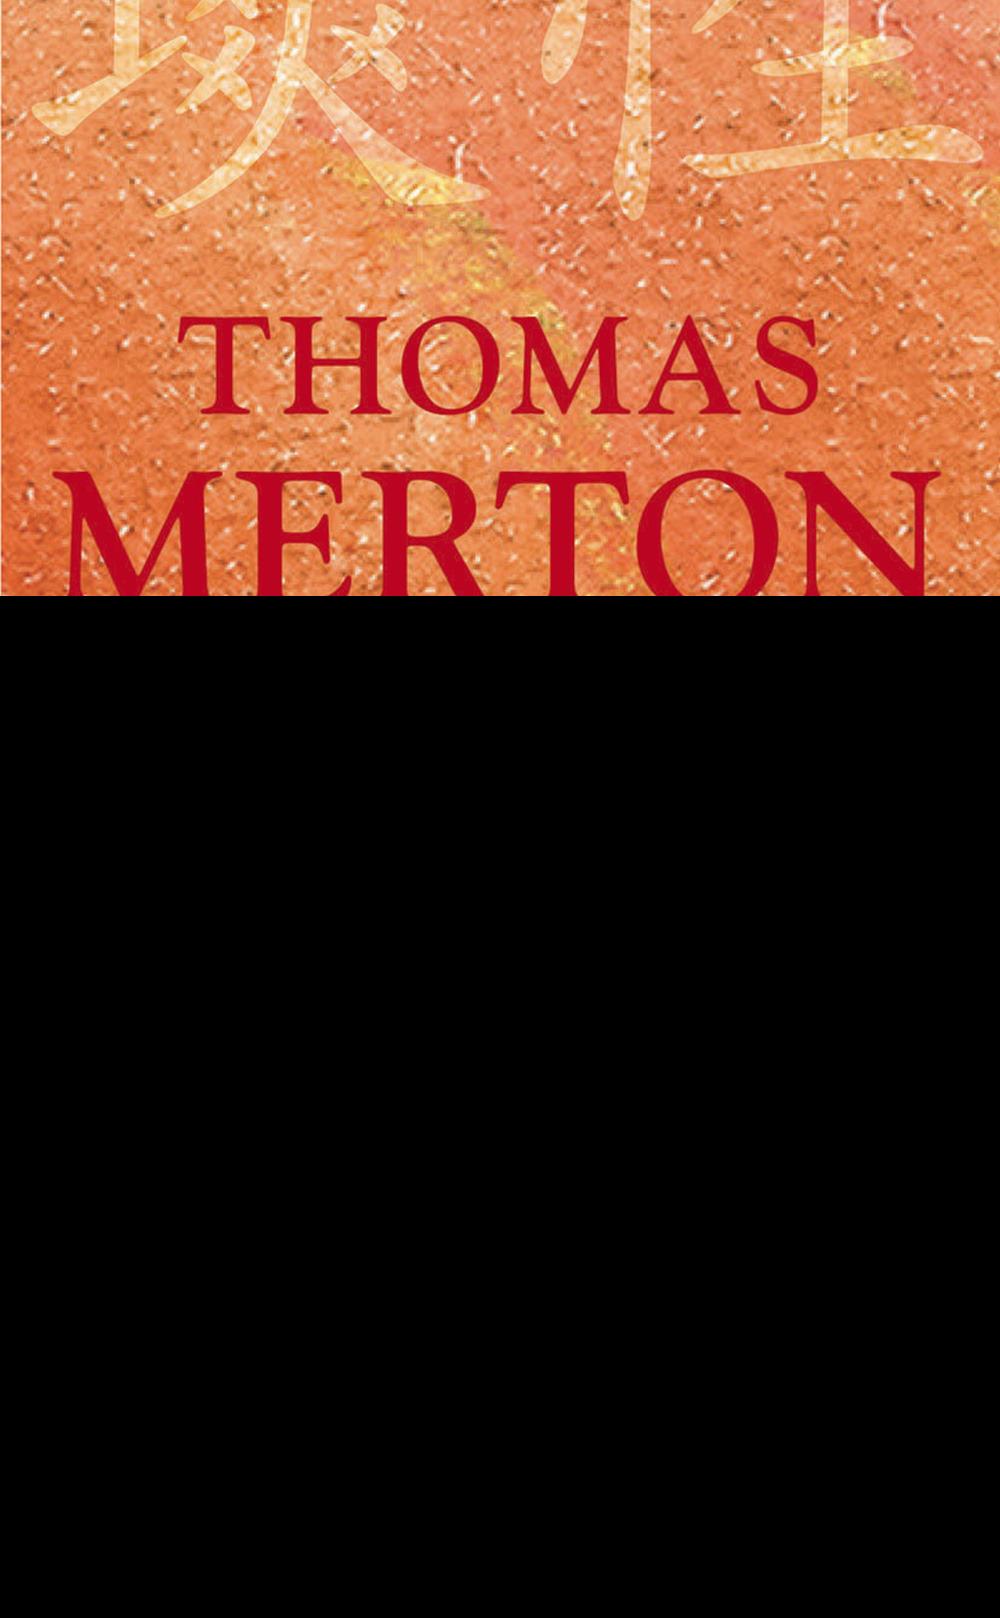 Thomas Merton La via semplice di Chuang Tzu Thomas Merton ISBN:9788831545563